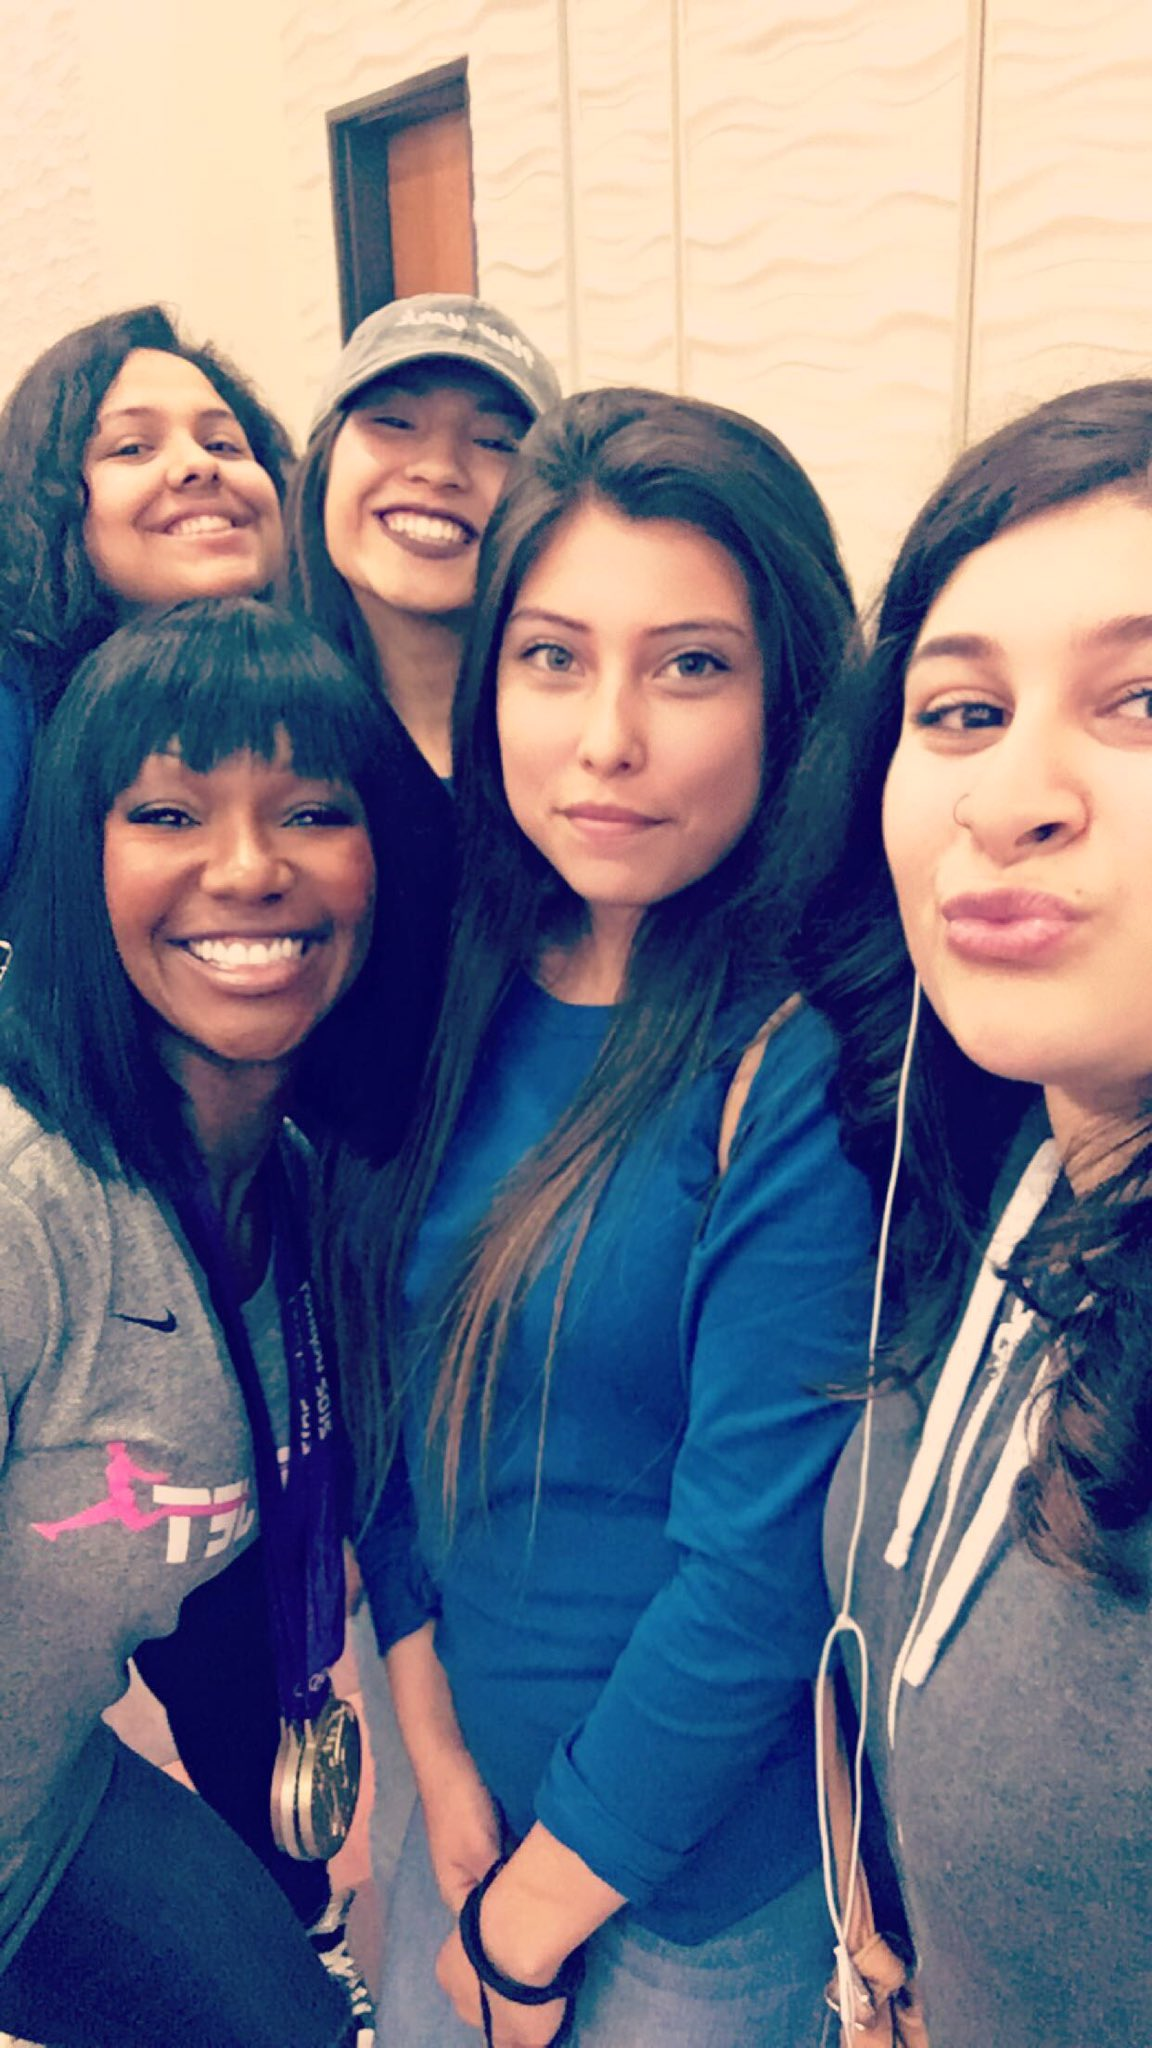 Had a great experience !!  #USC #GirlsBuildLA #girlpower @CarmelitaJeter https://t.co/EQ6v1uwlI4